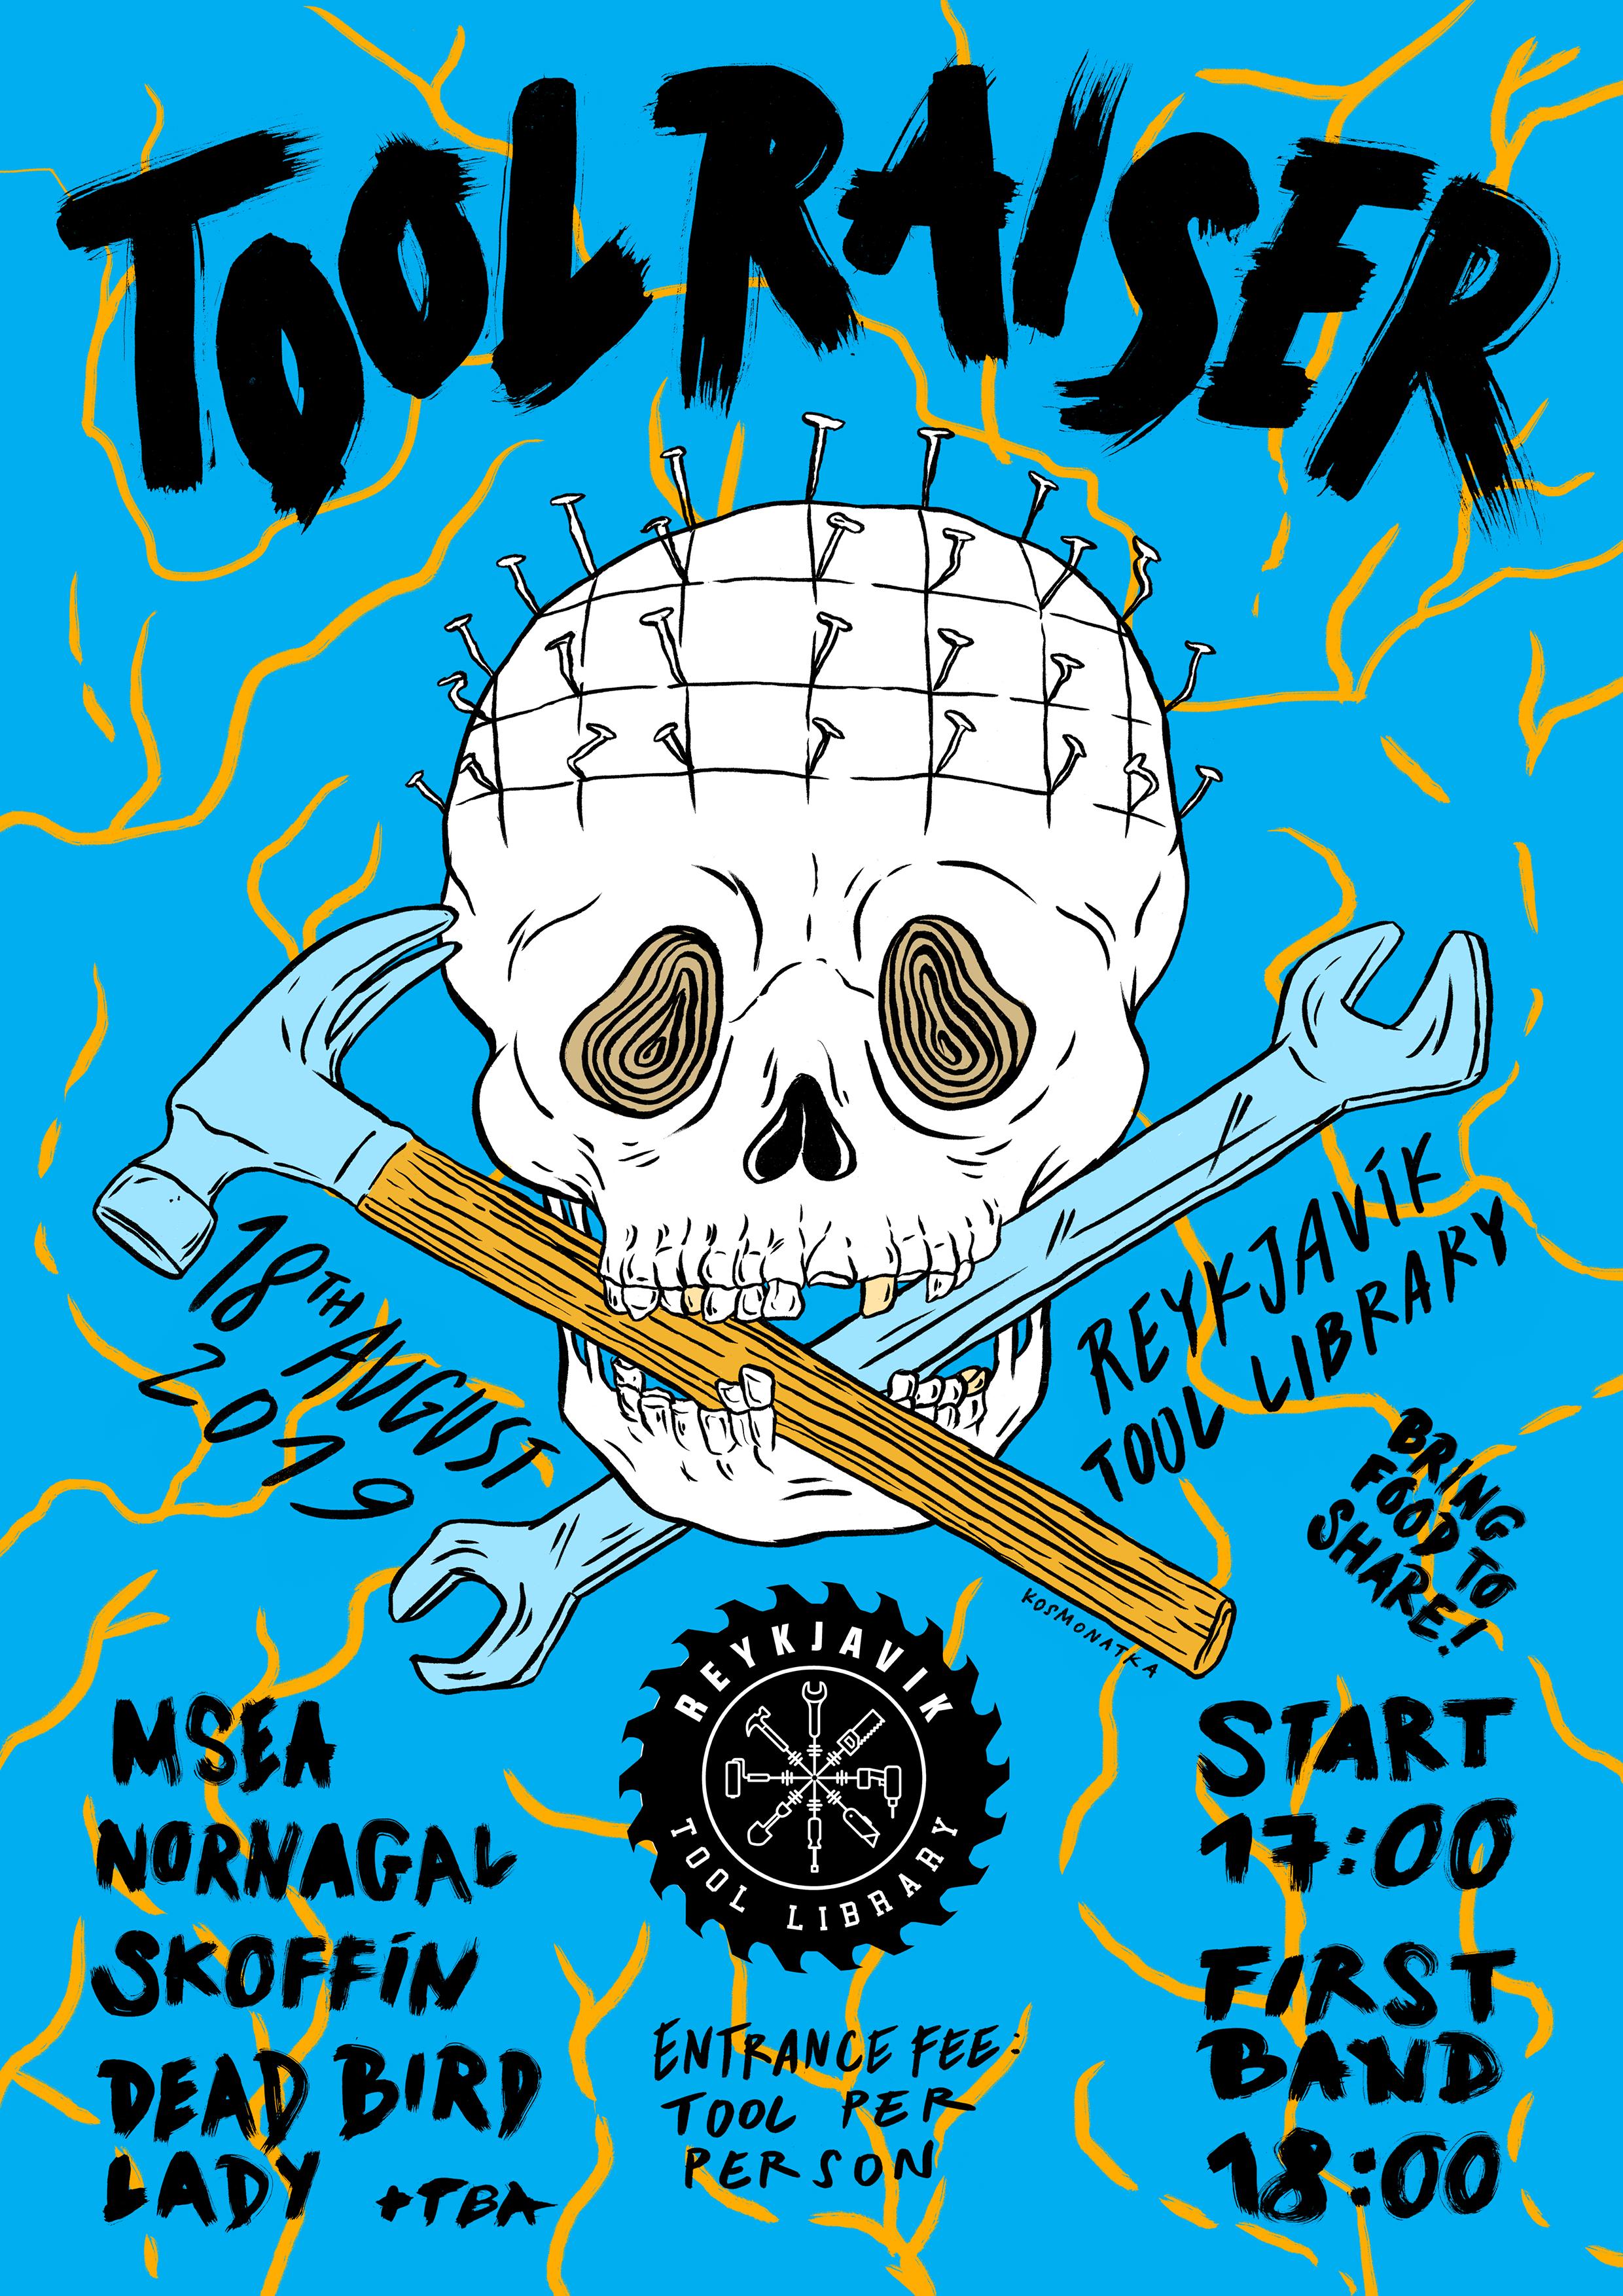 toolraiser_2019_poster_a4.jpg